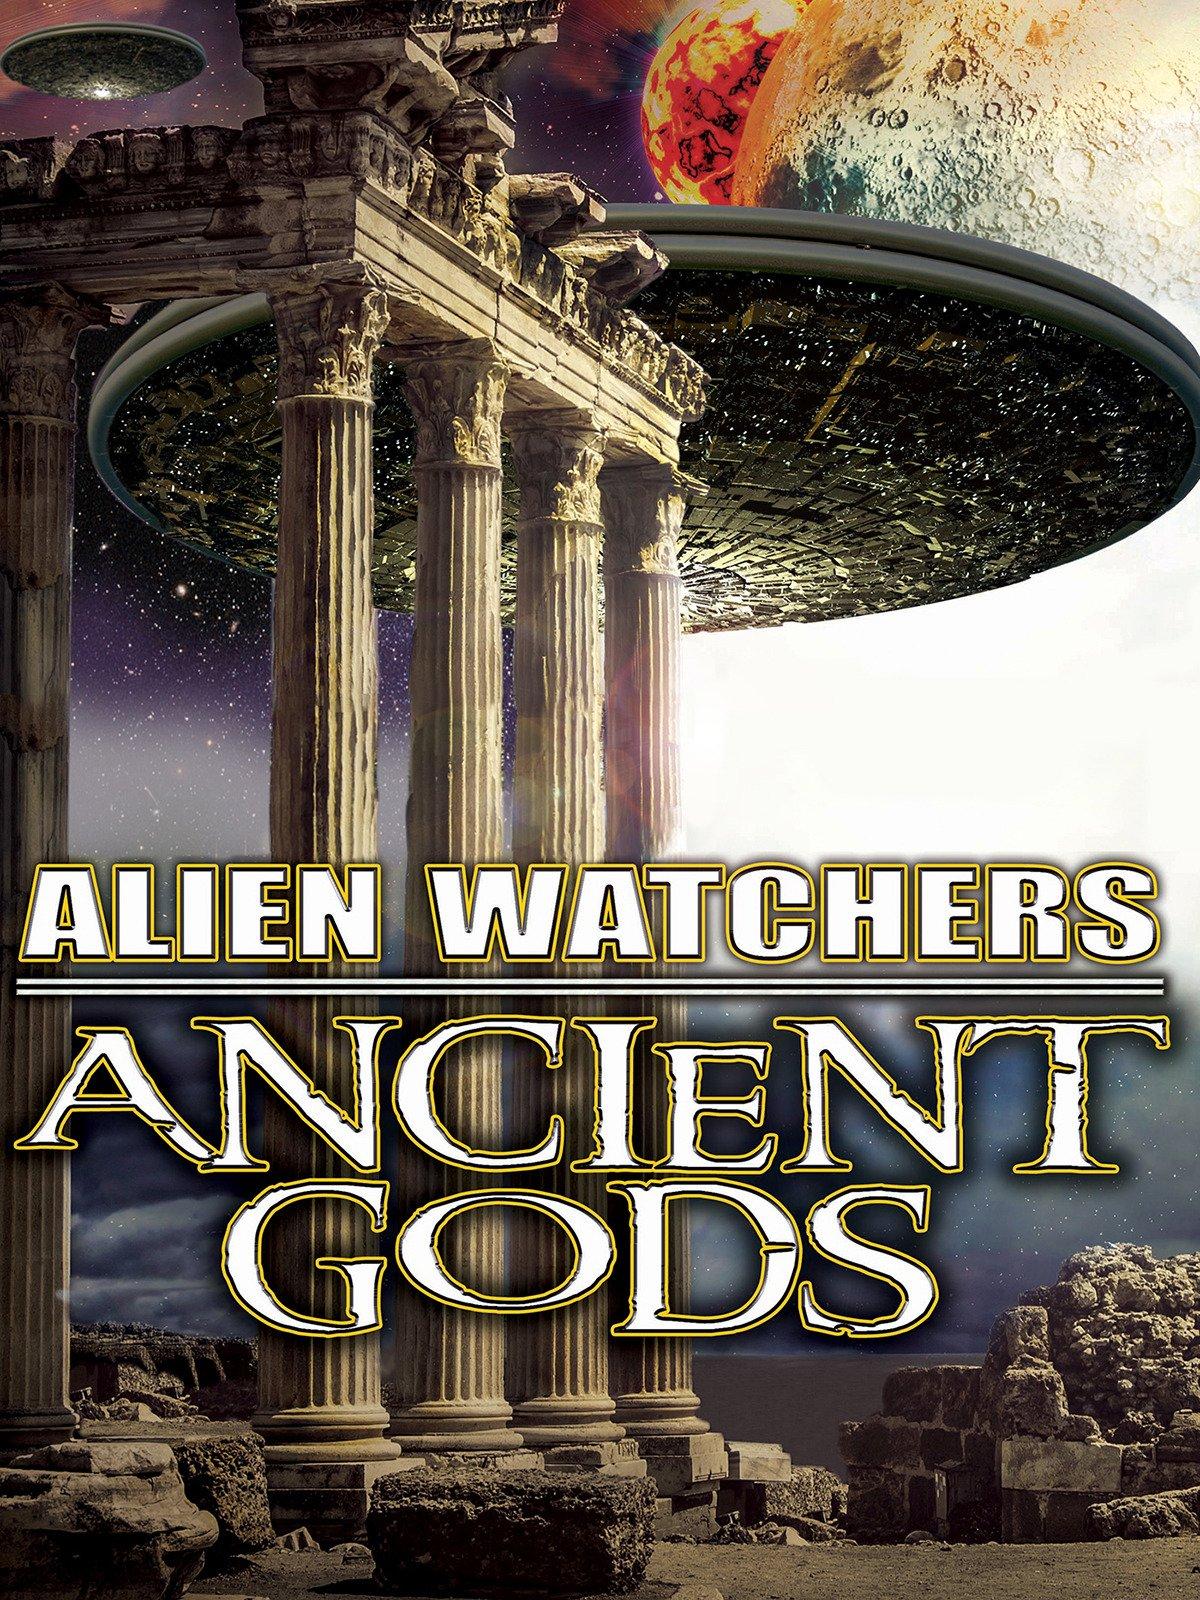 Alien Watchers: Ancient Gods on Amazon Prime Video UK